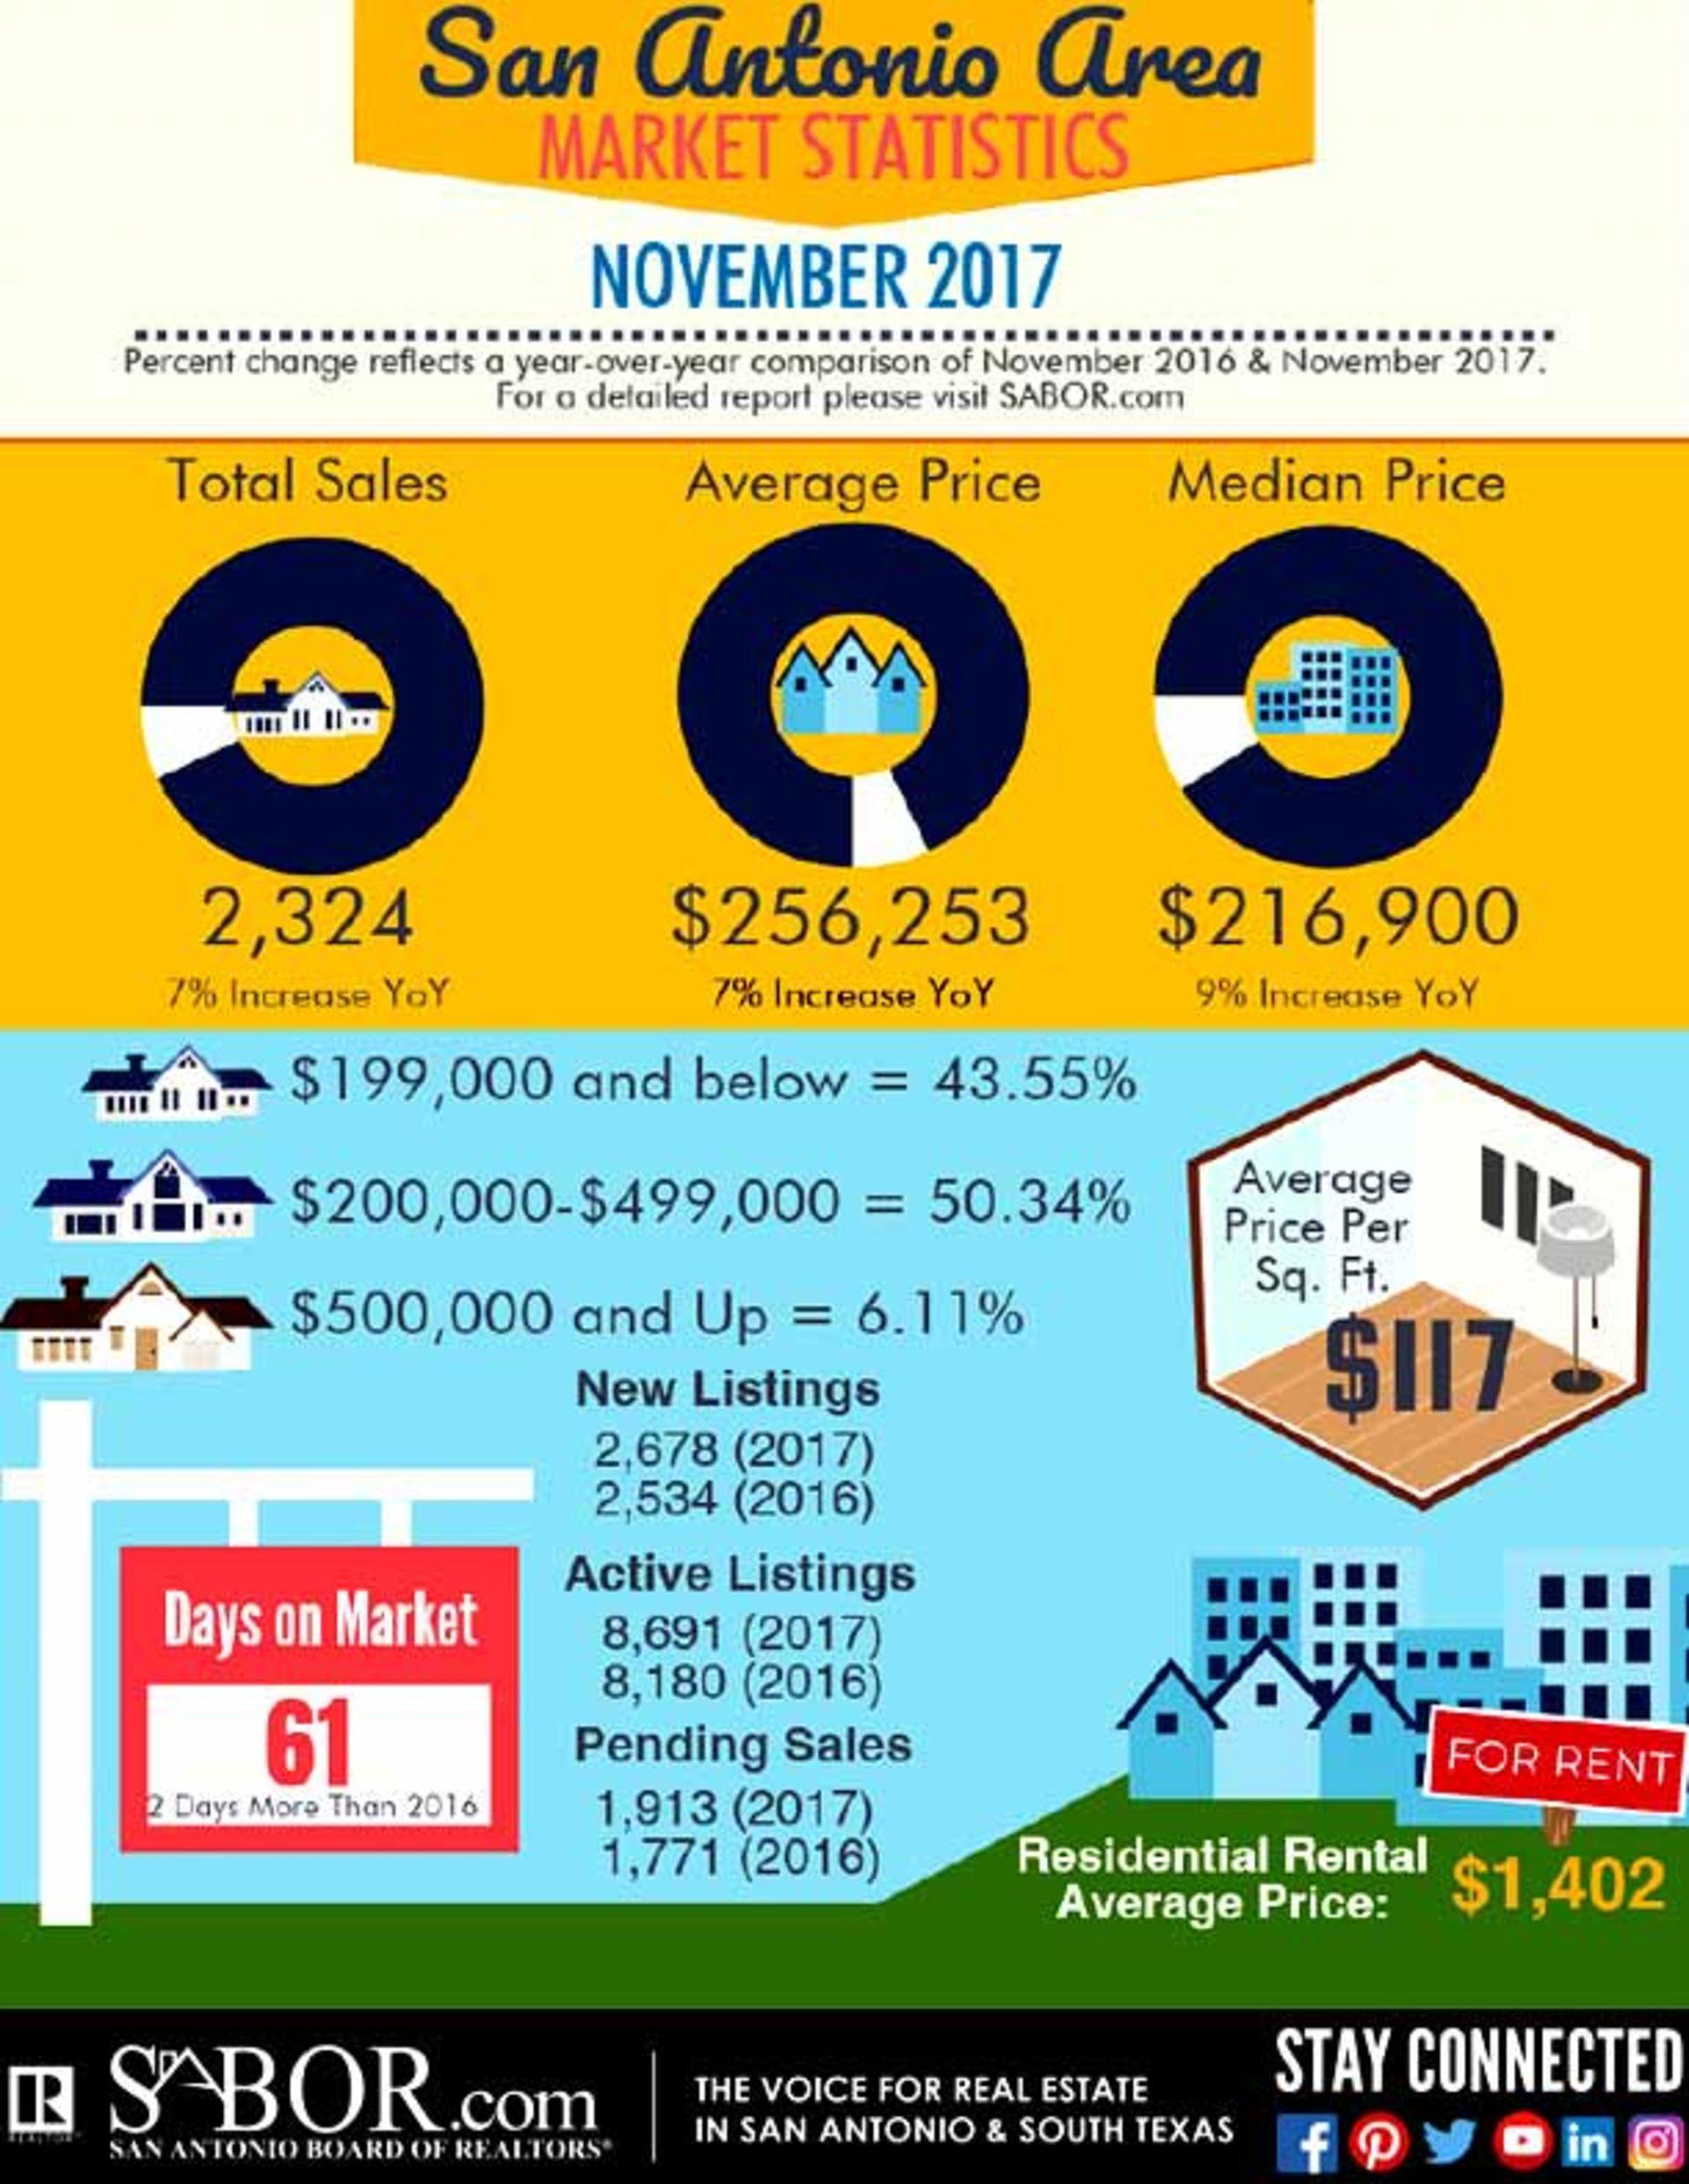 San Antonio Area November Home Sales Outpaced 2016 in November